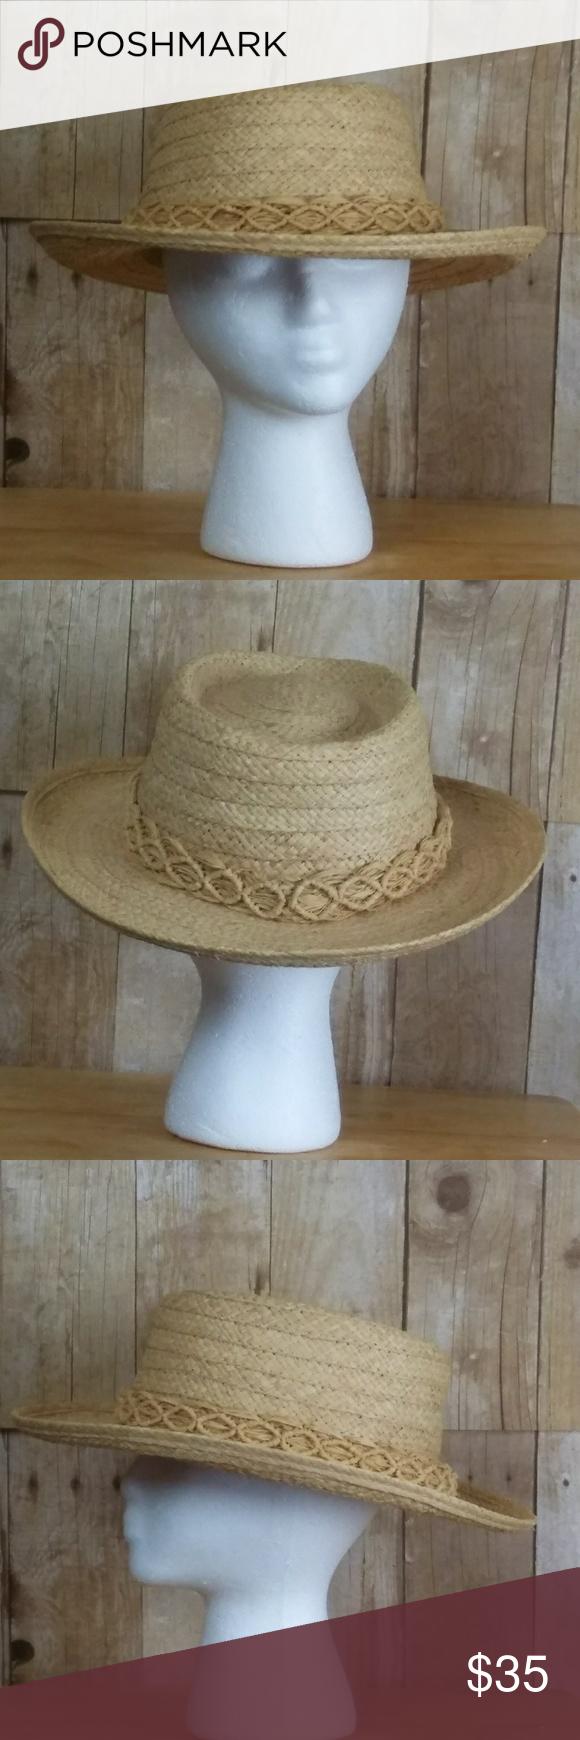 Genuine Raffia Dorfman Pacific Hat Size L Xl Hat Sizes Clothes Design Fashion Tips